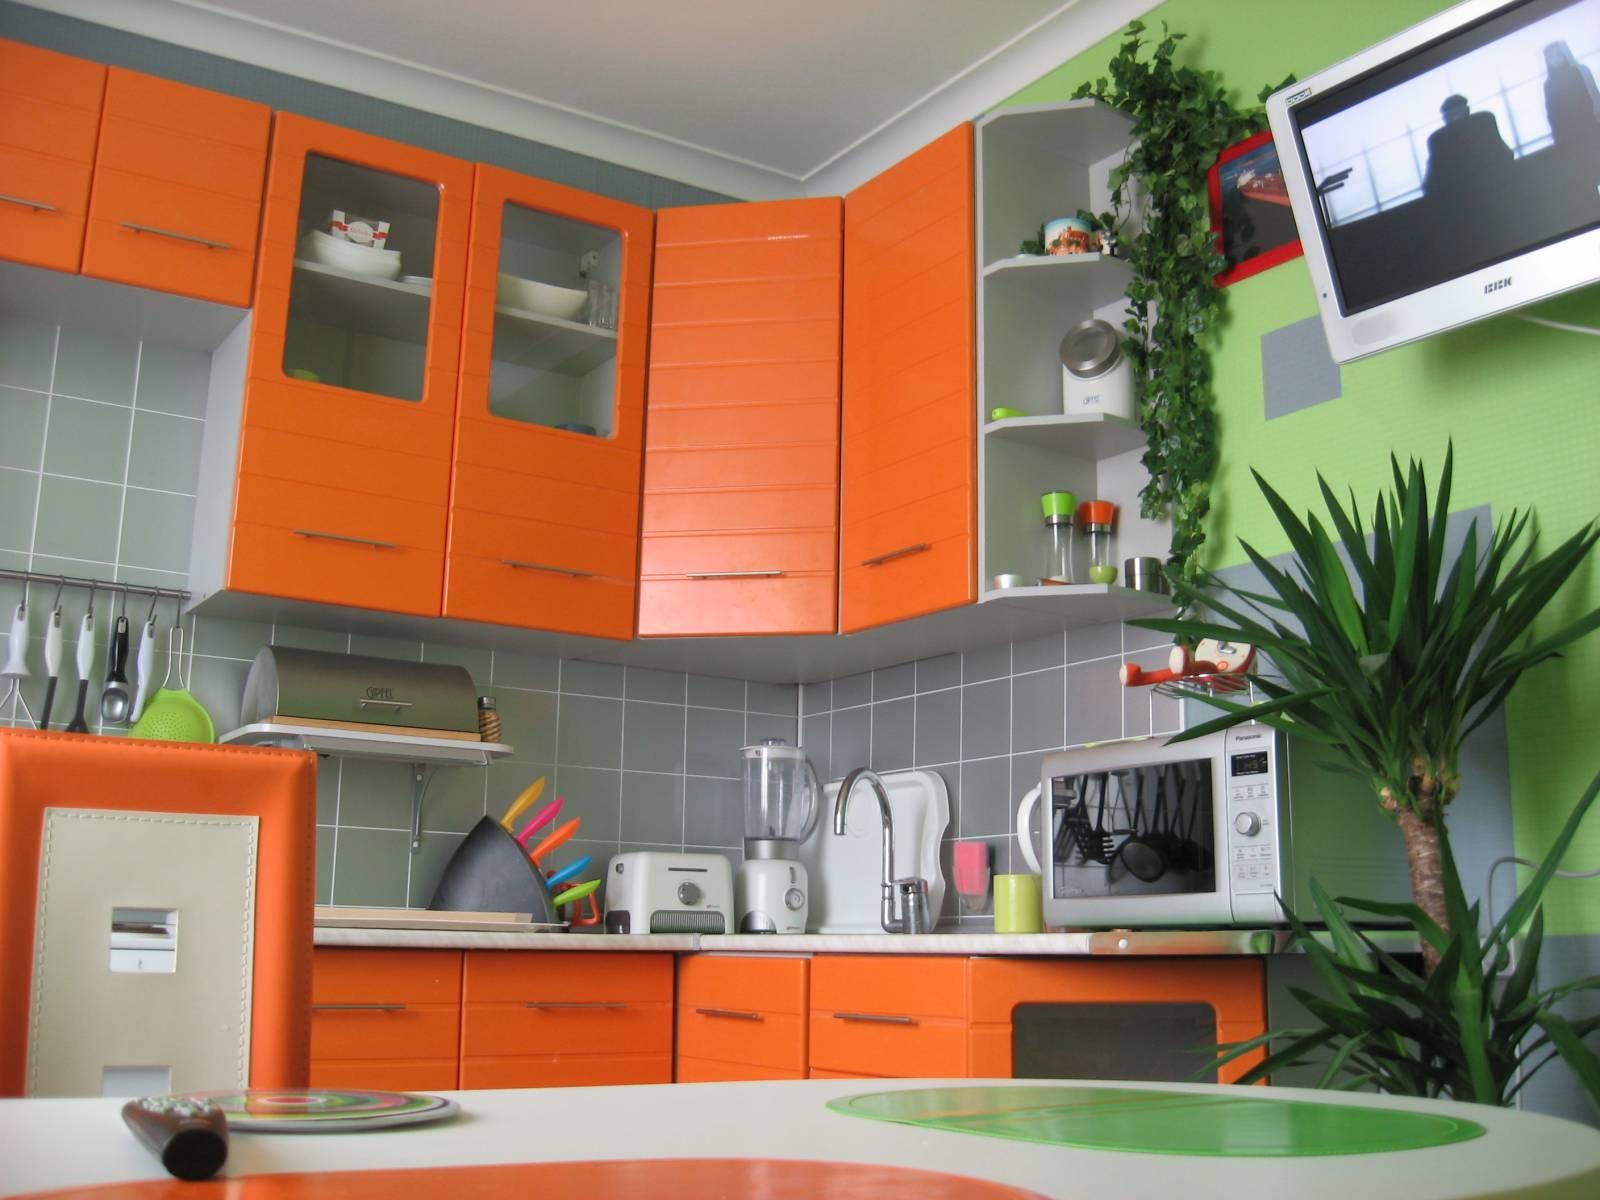 Навесные шкафы на кухню разнообразны